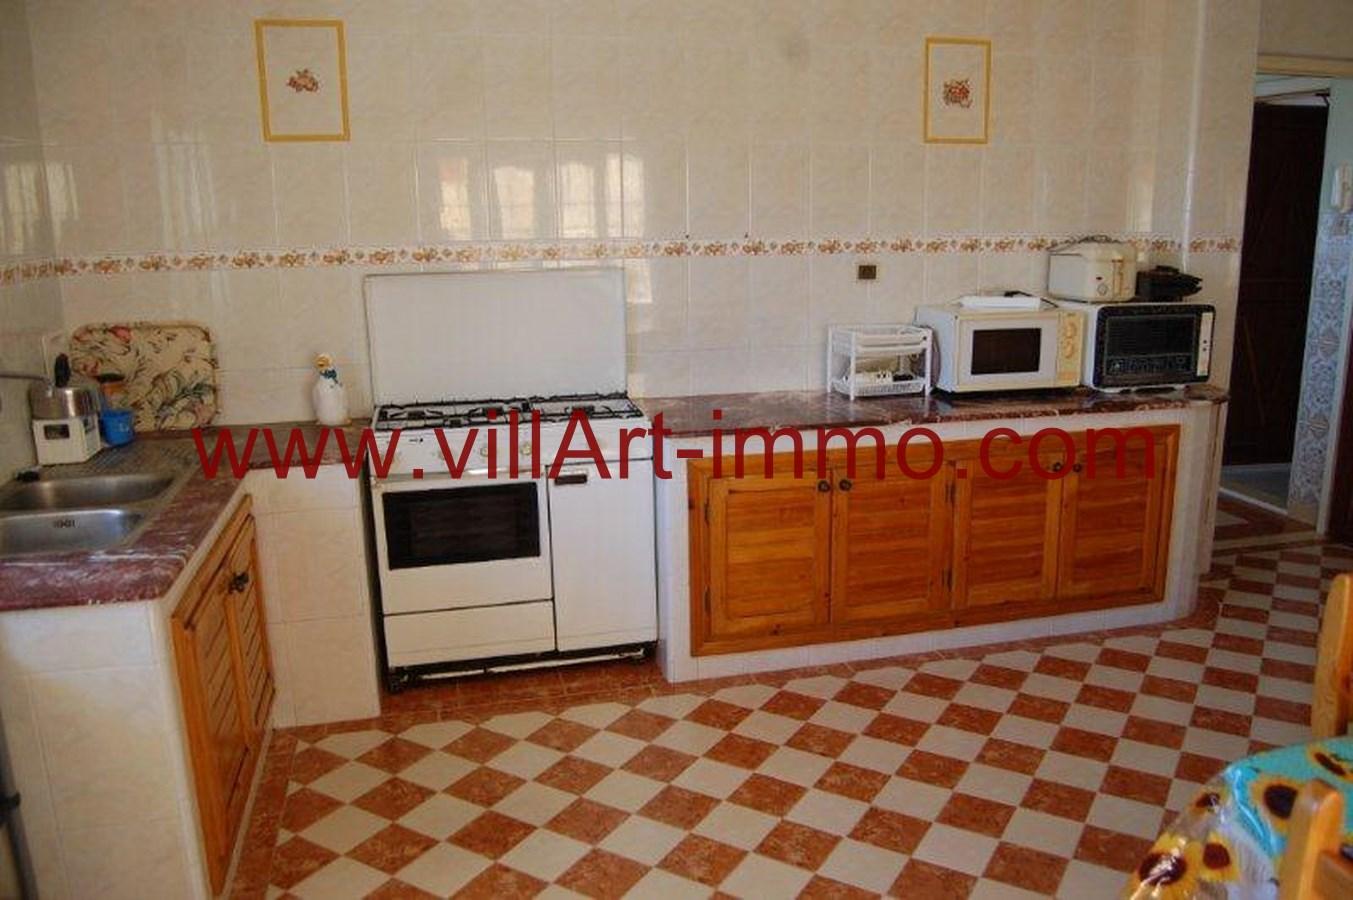 7-Location-Maison-Meublé-Tanger-Kser-Sghir-Cuisine-LV245-Villart-immo